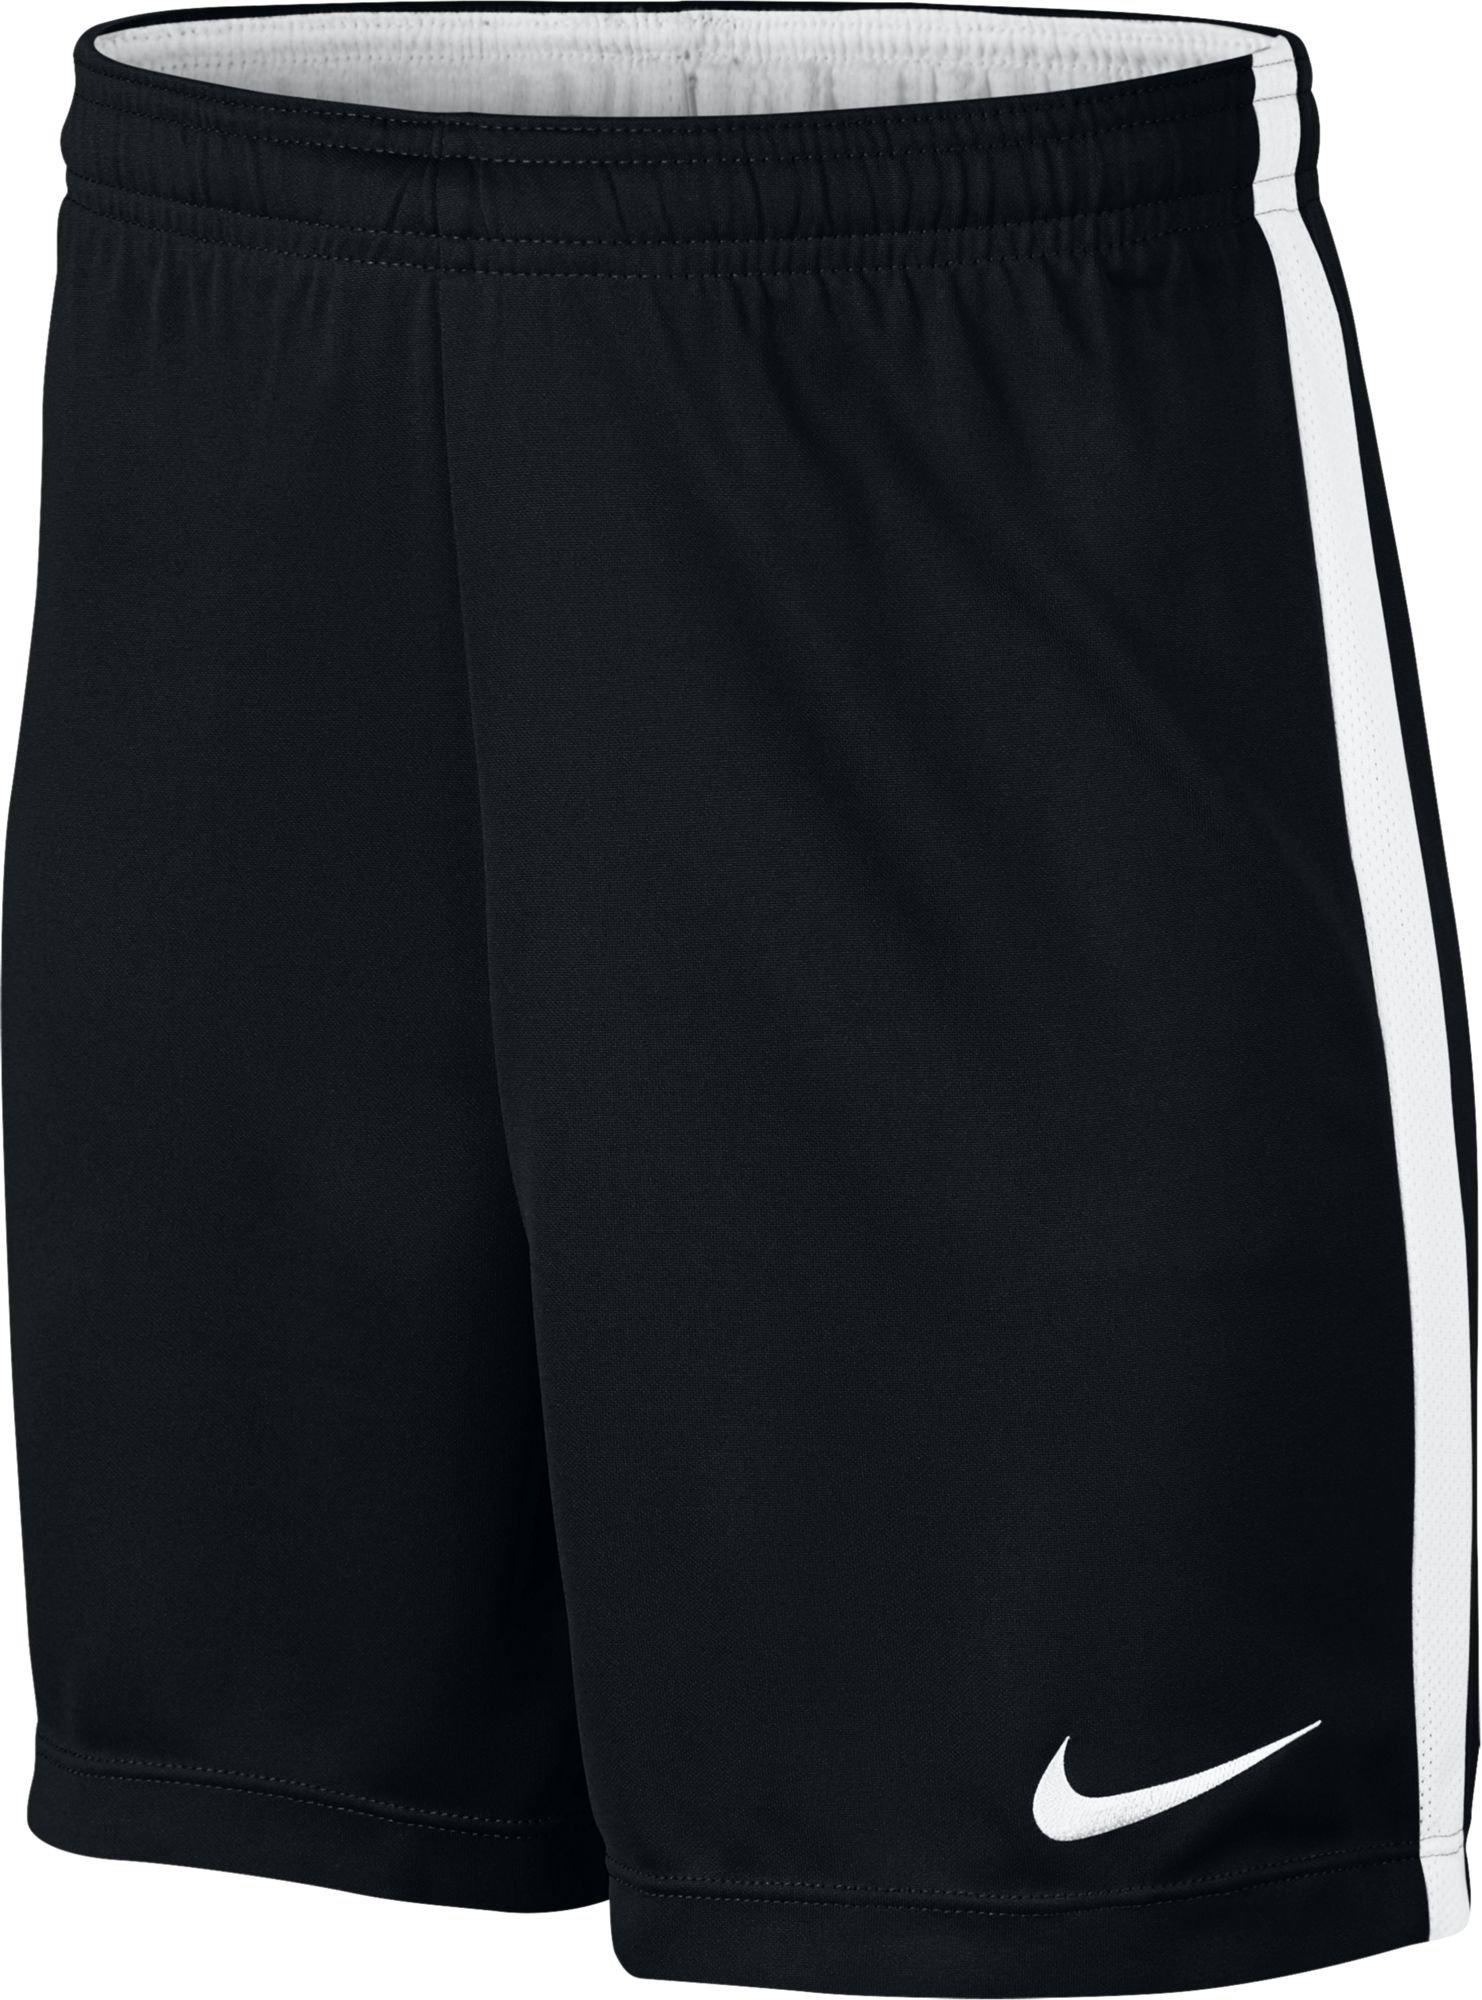 NIKE Kids Dry Academy Football Short Black/White Size X-Large